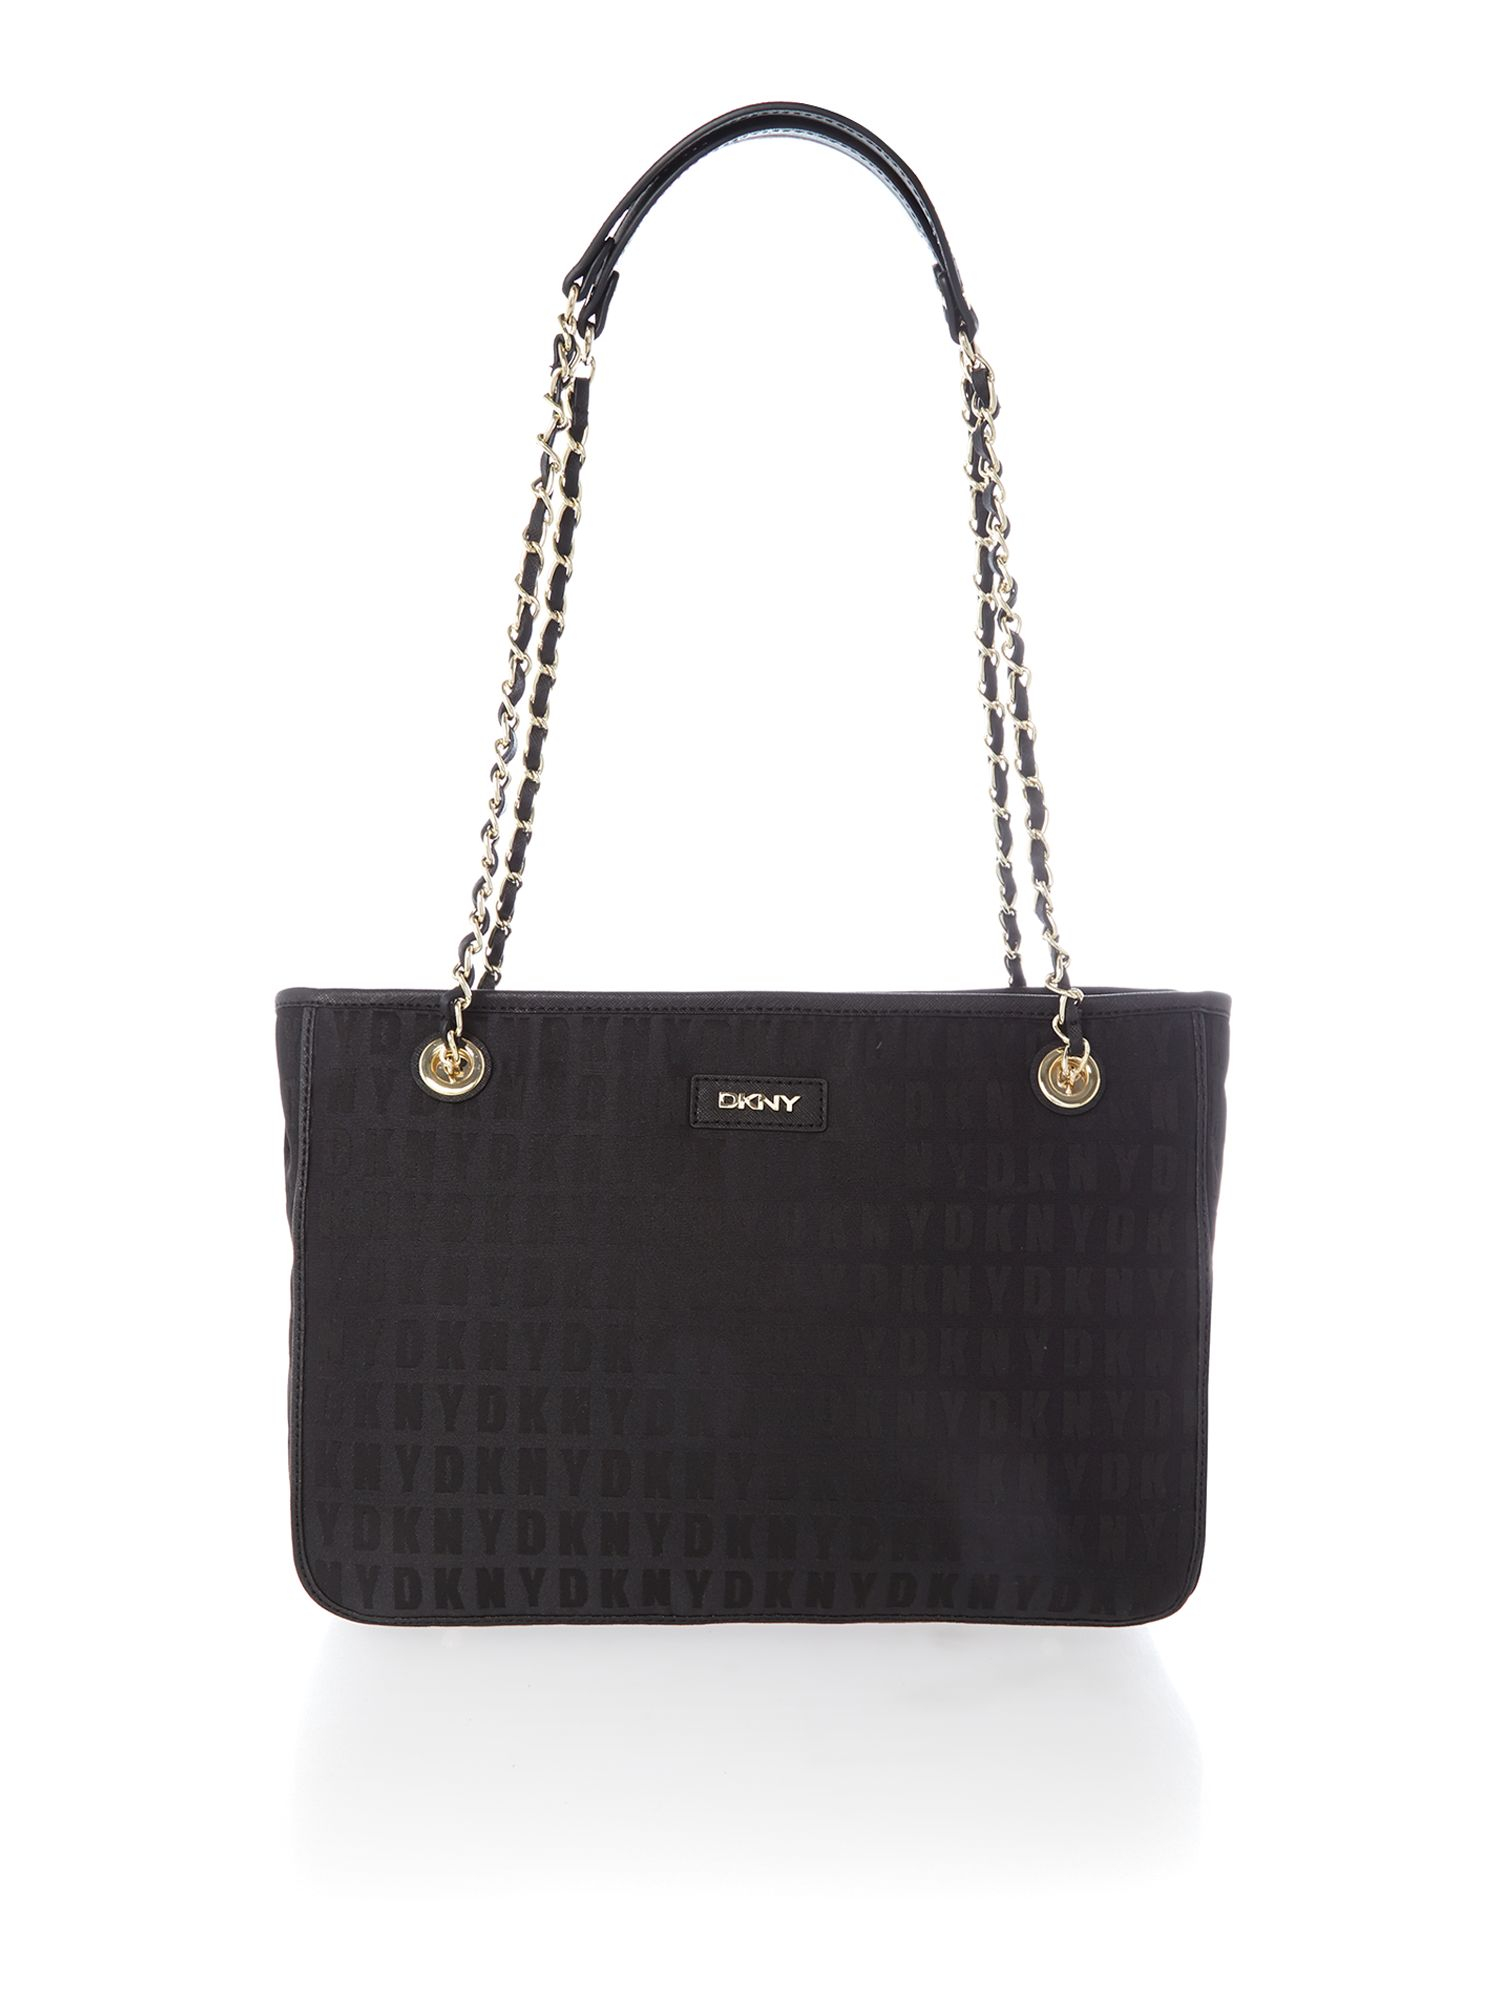 dkny black chain tote bag in black lyst